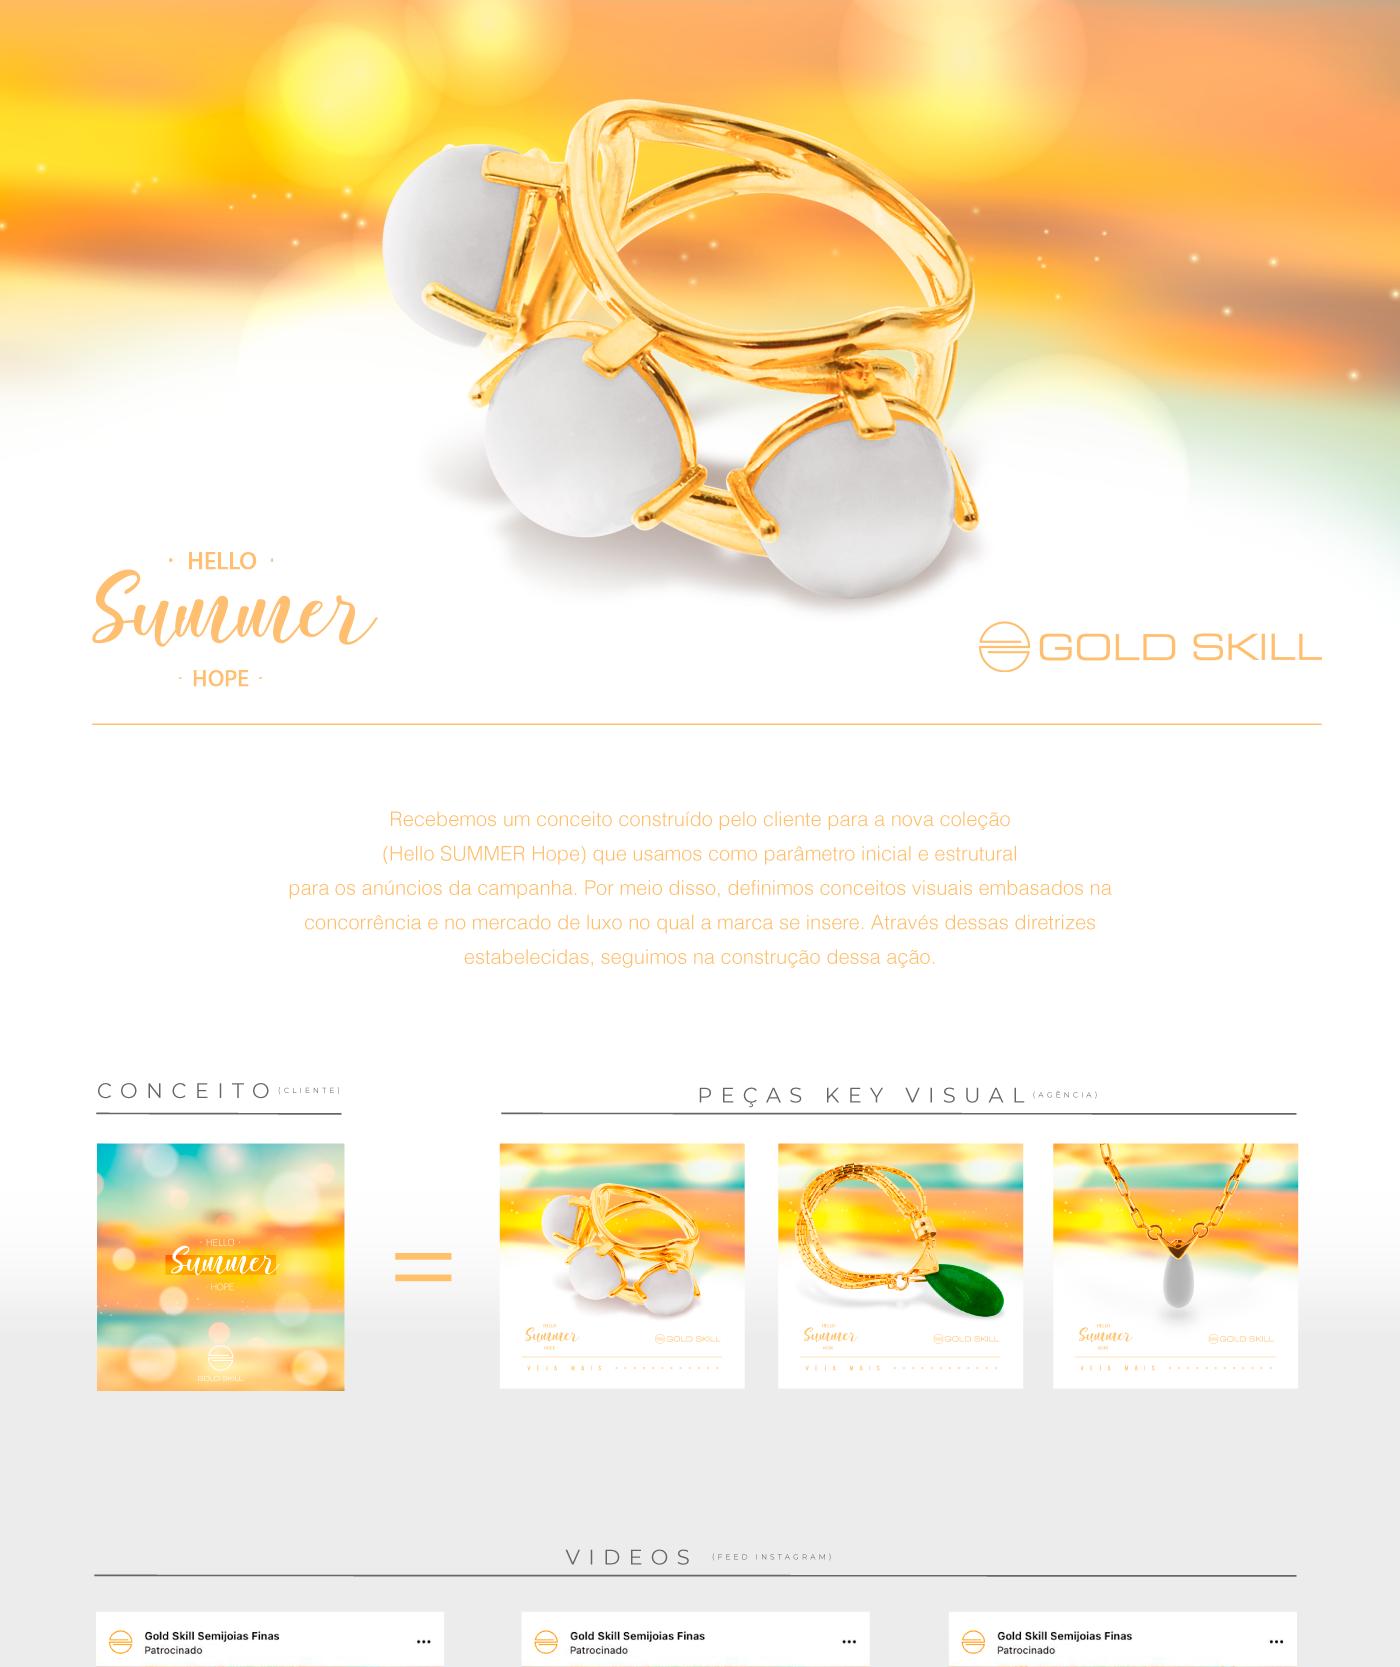 campanha Dark Post digital Fashion  gold skill luxo motion semi joia video webfuel